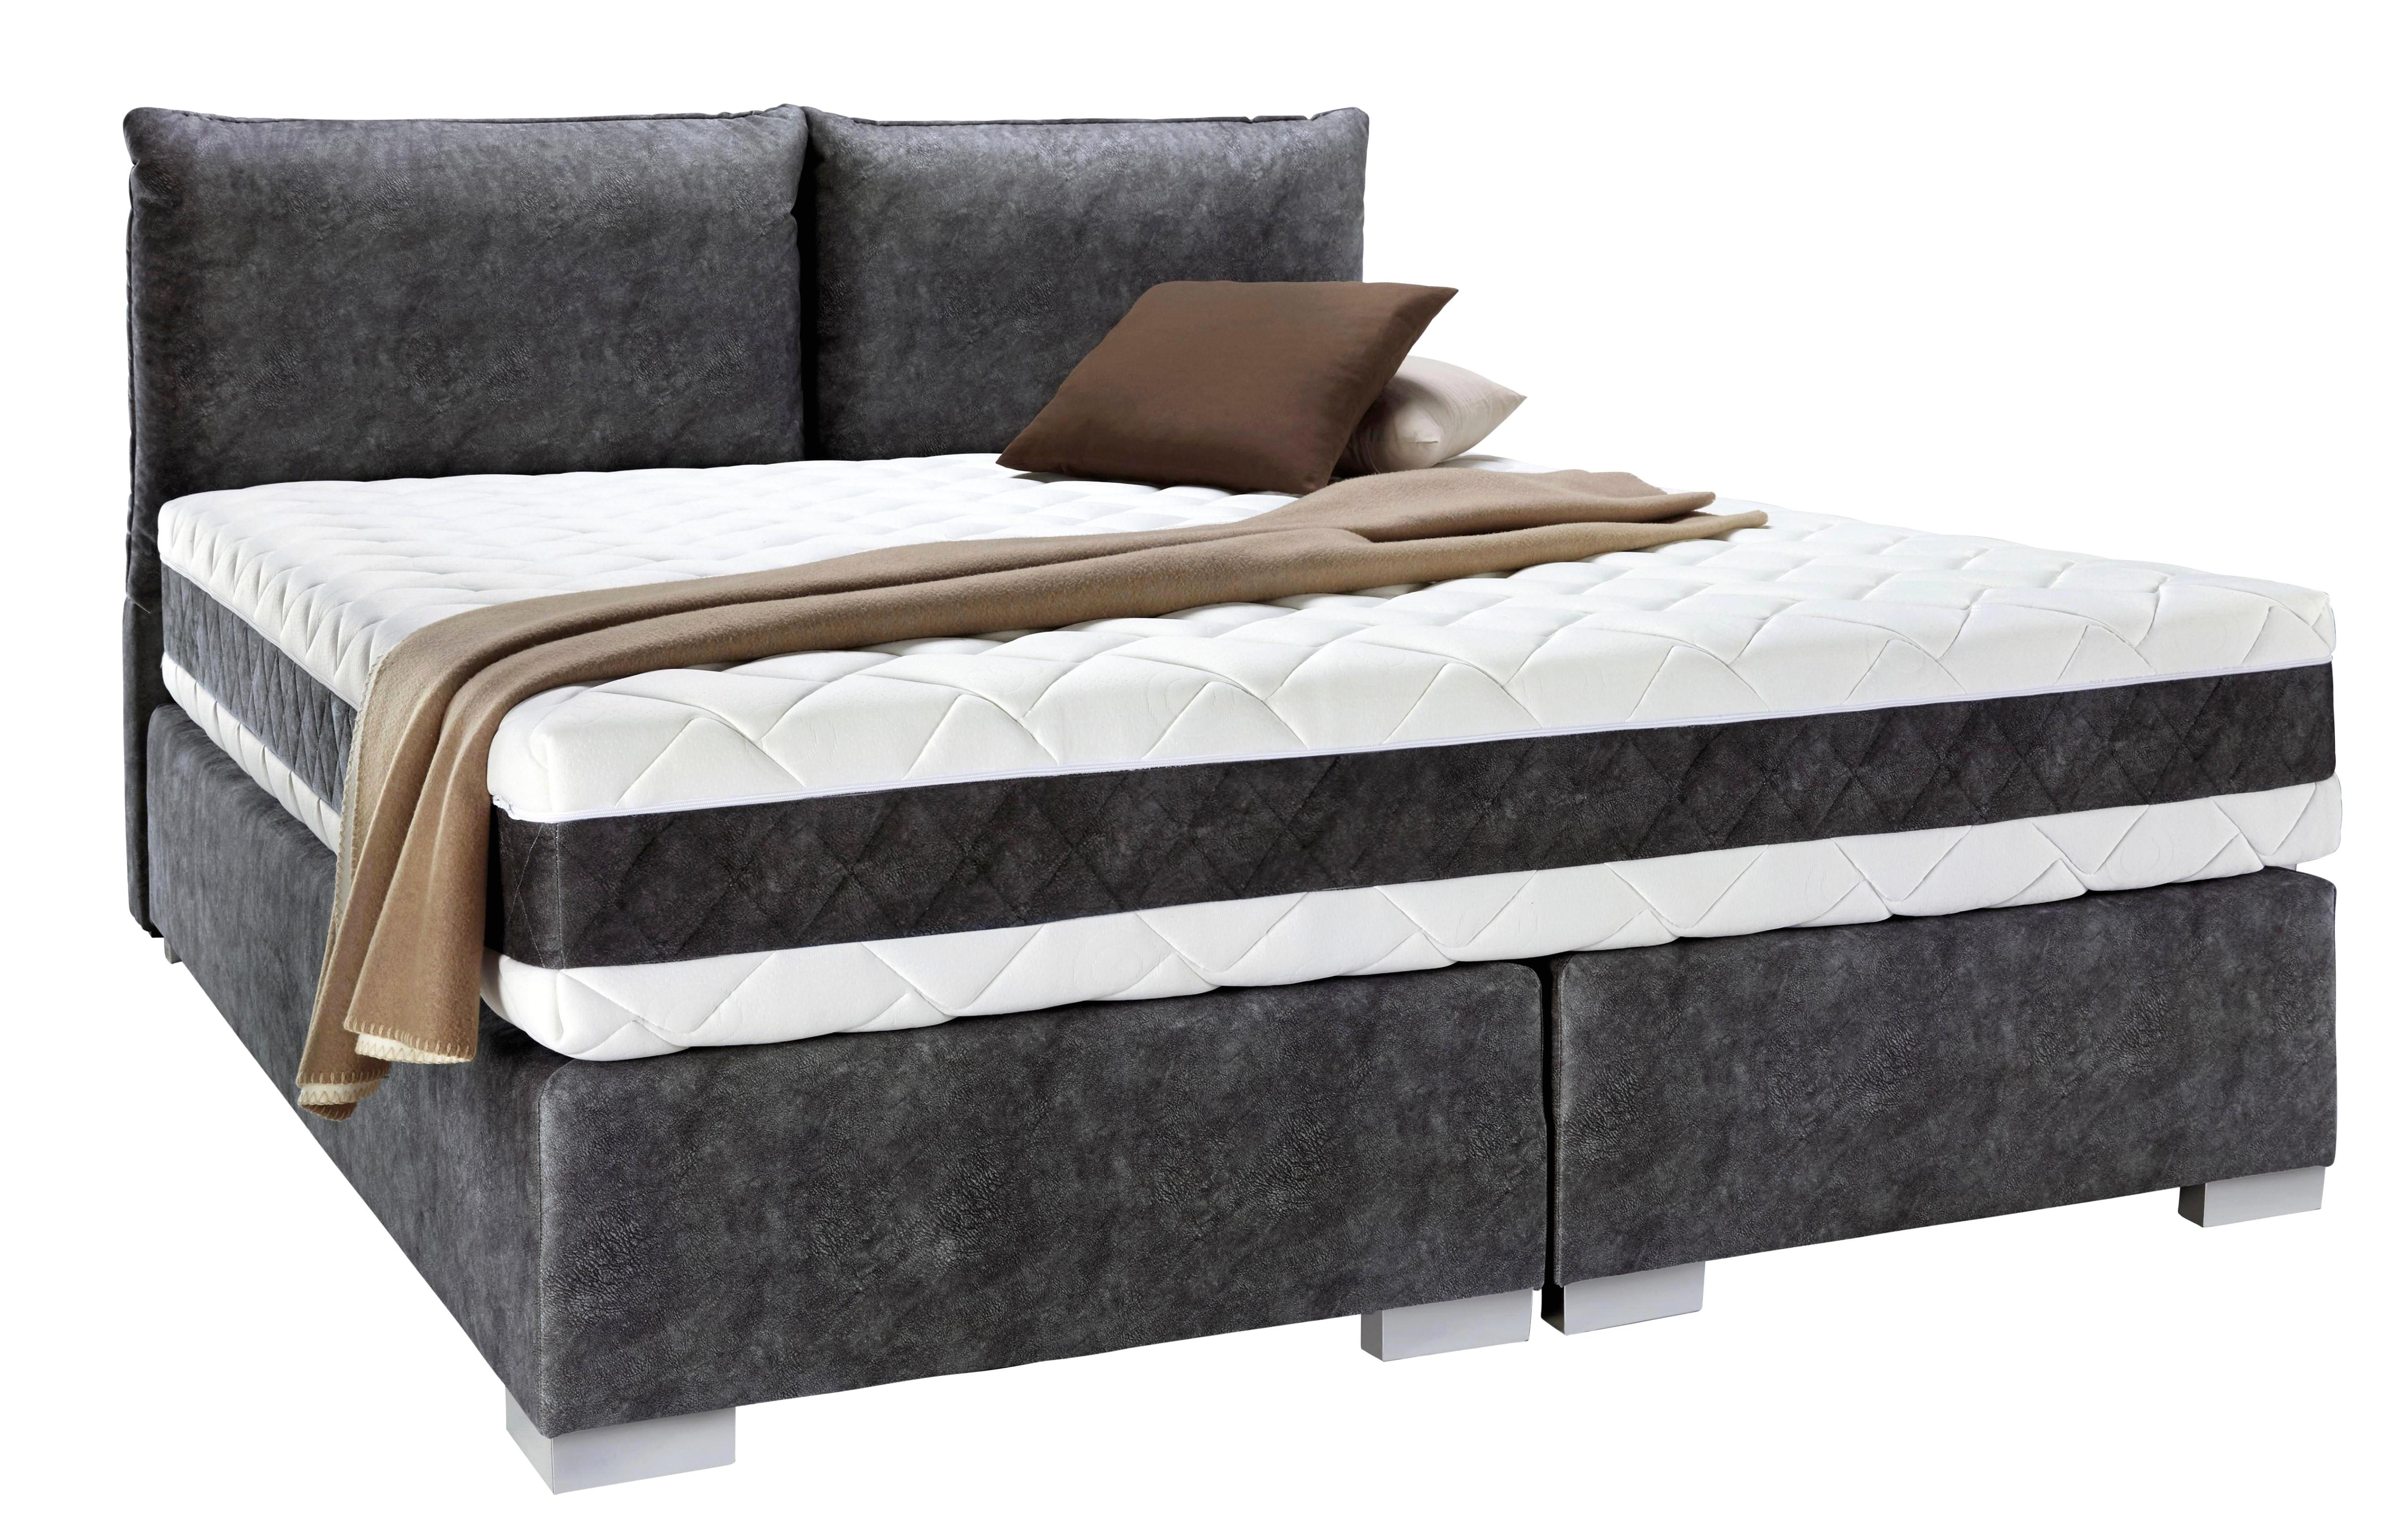 ikea matras morgedal fresh materassi memory foam ikea mattress sizes ikea unique daybed collection of ikea